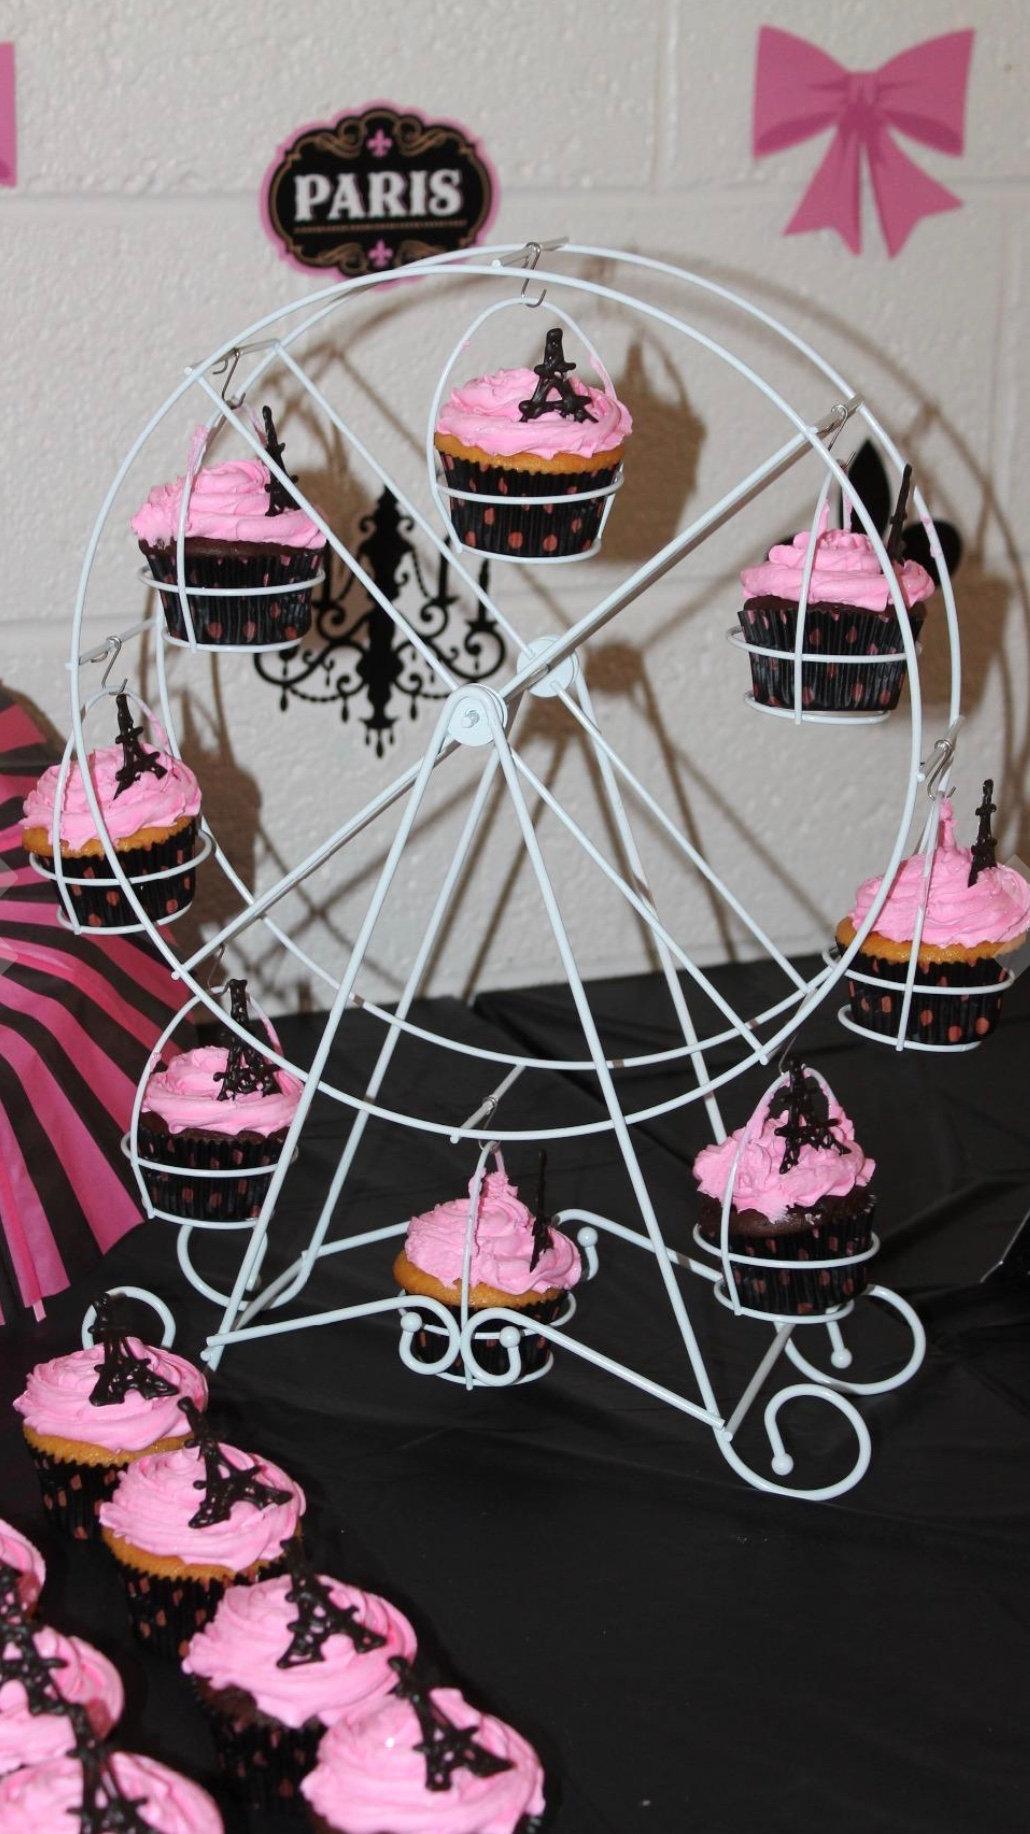 Cupcake ferris wheel stand